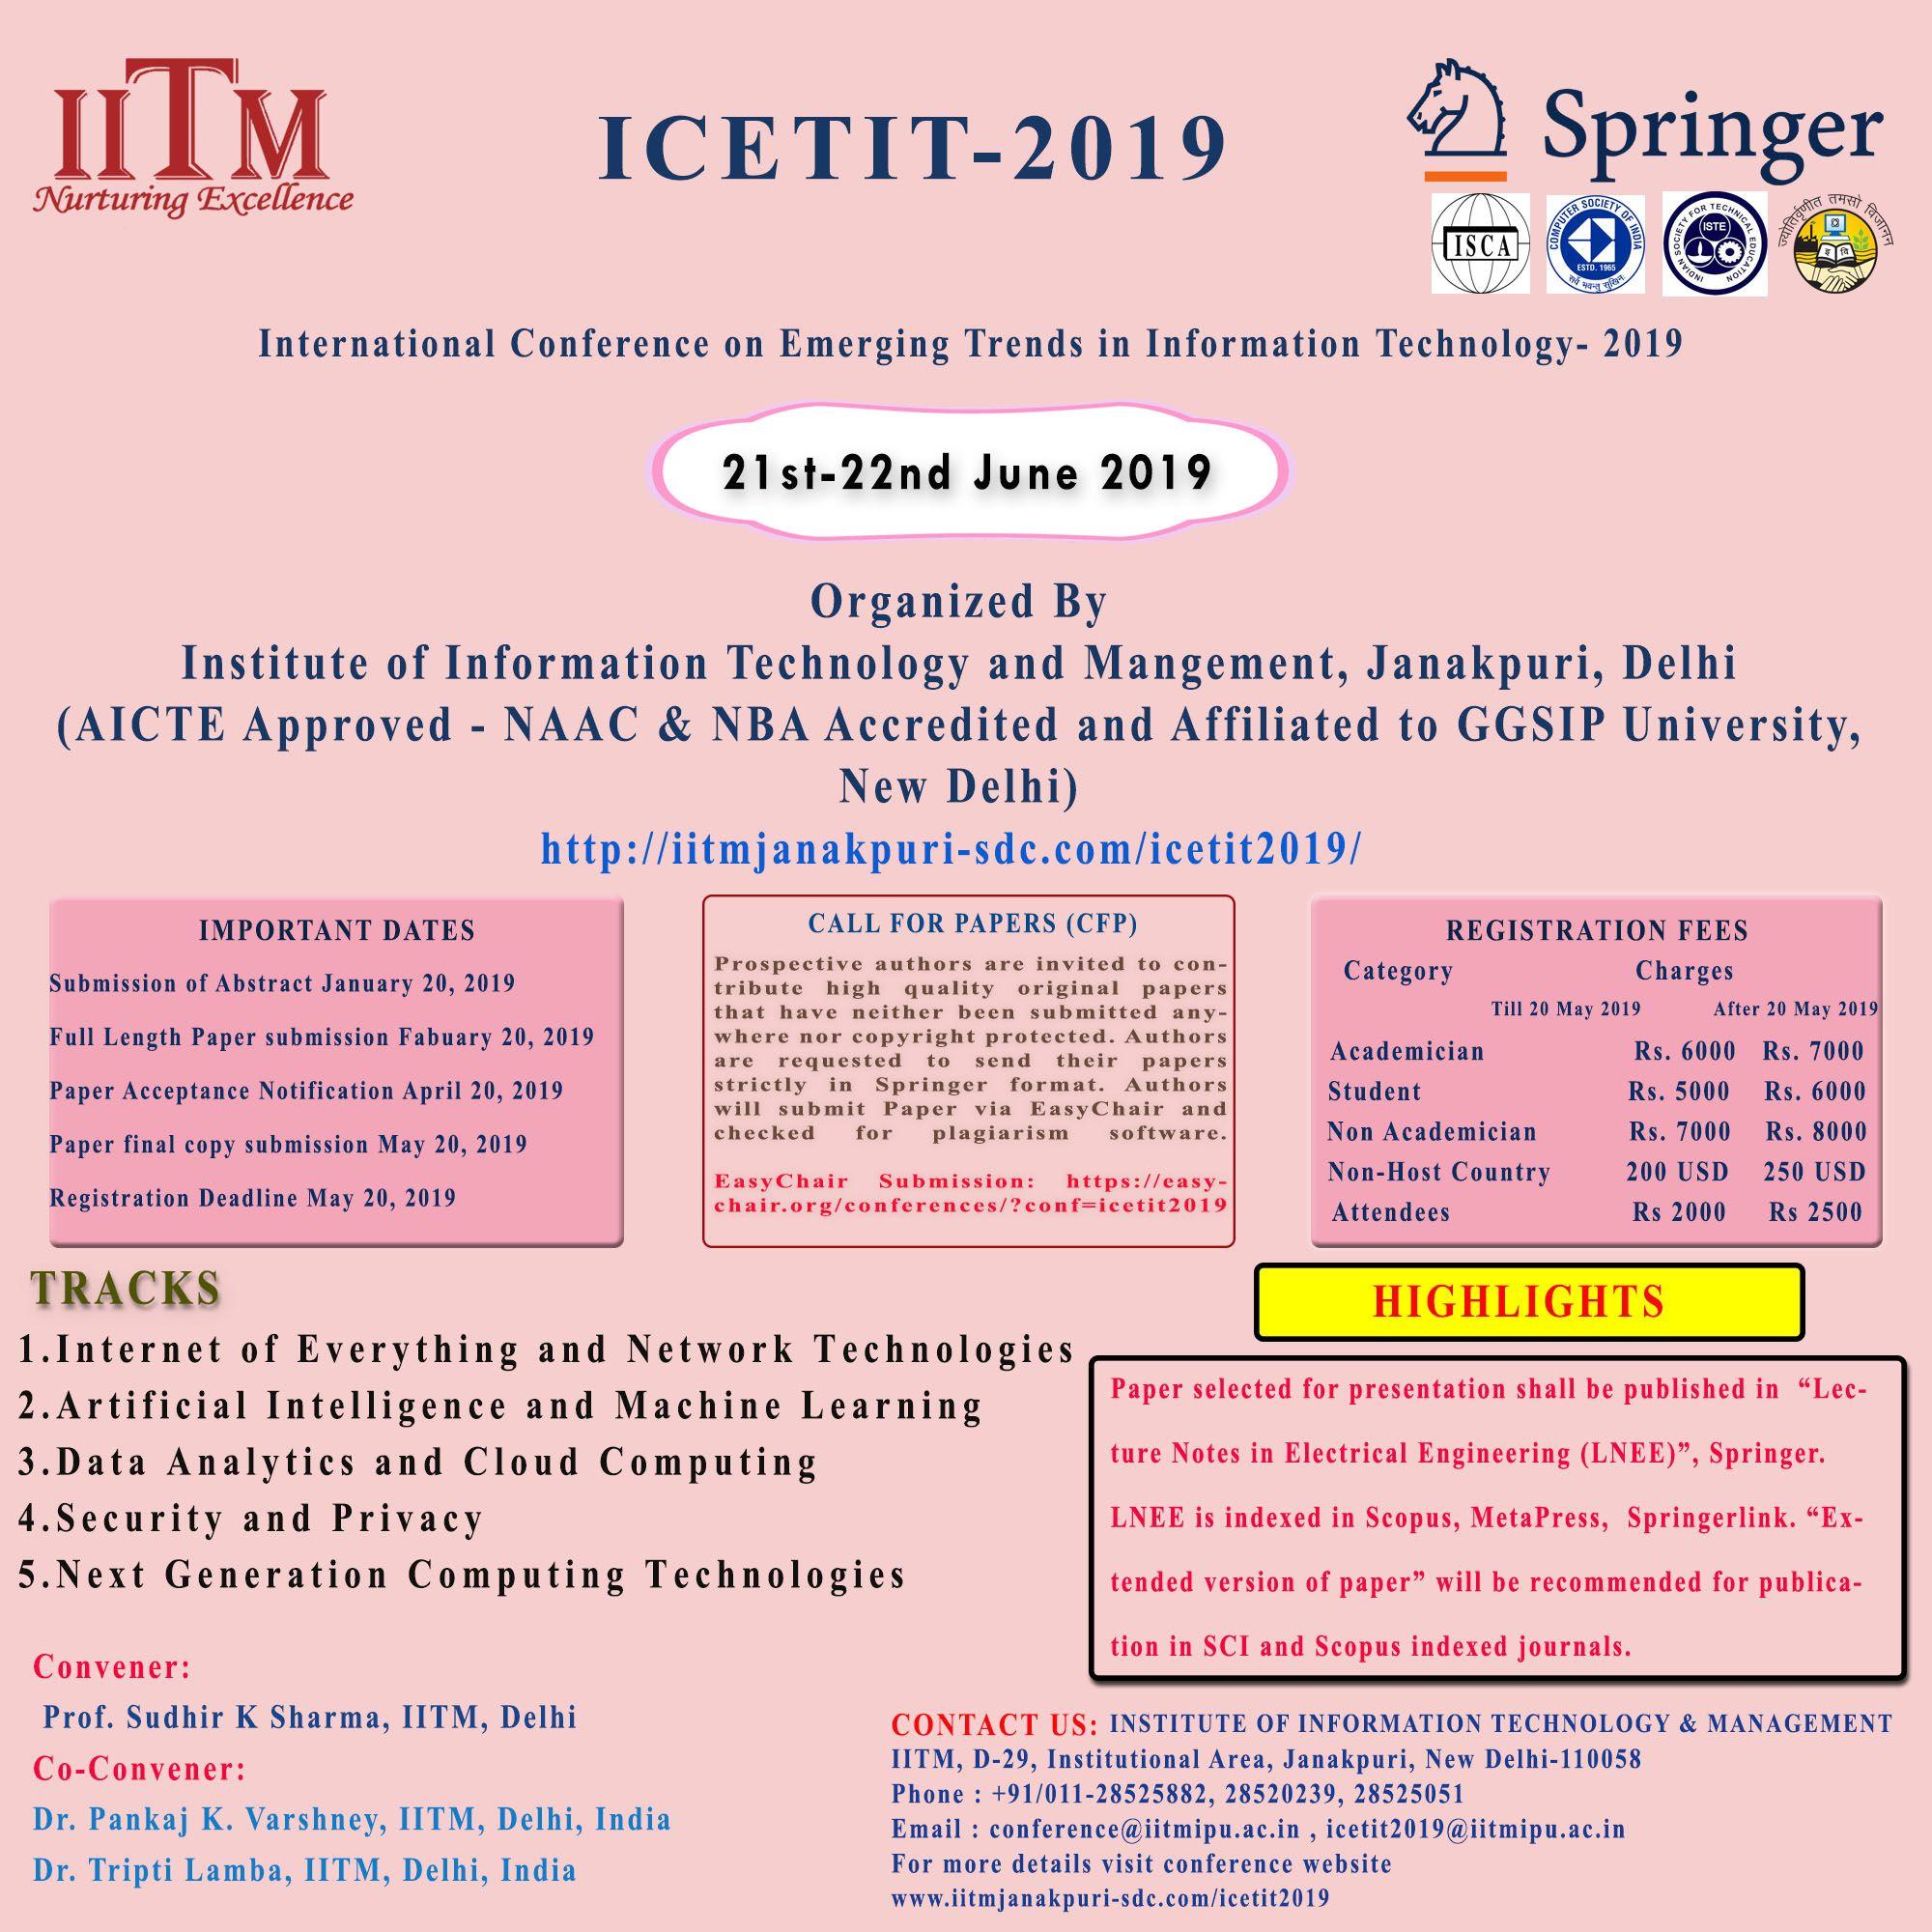 Pin by IITM Janakpuri on International Conference 2019